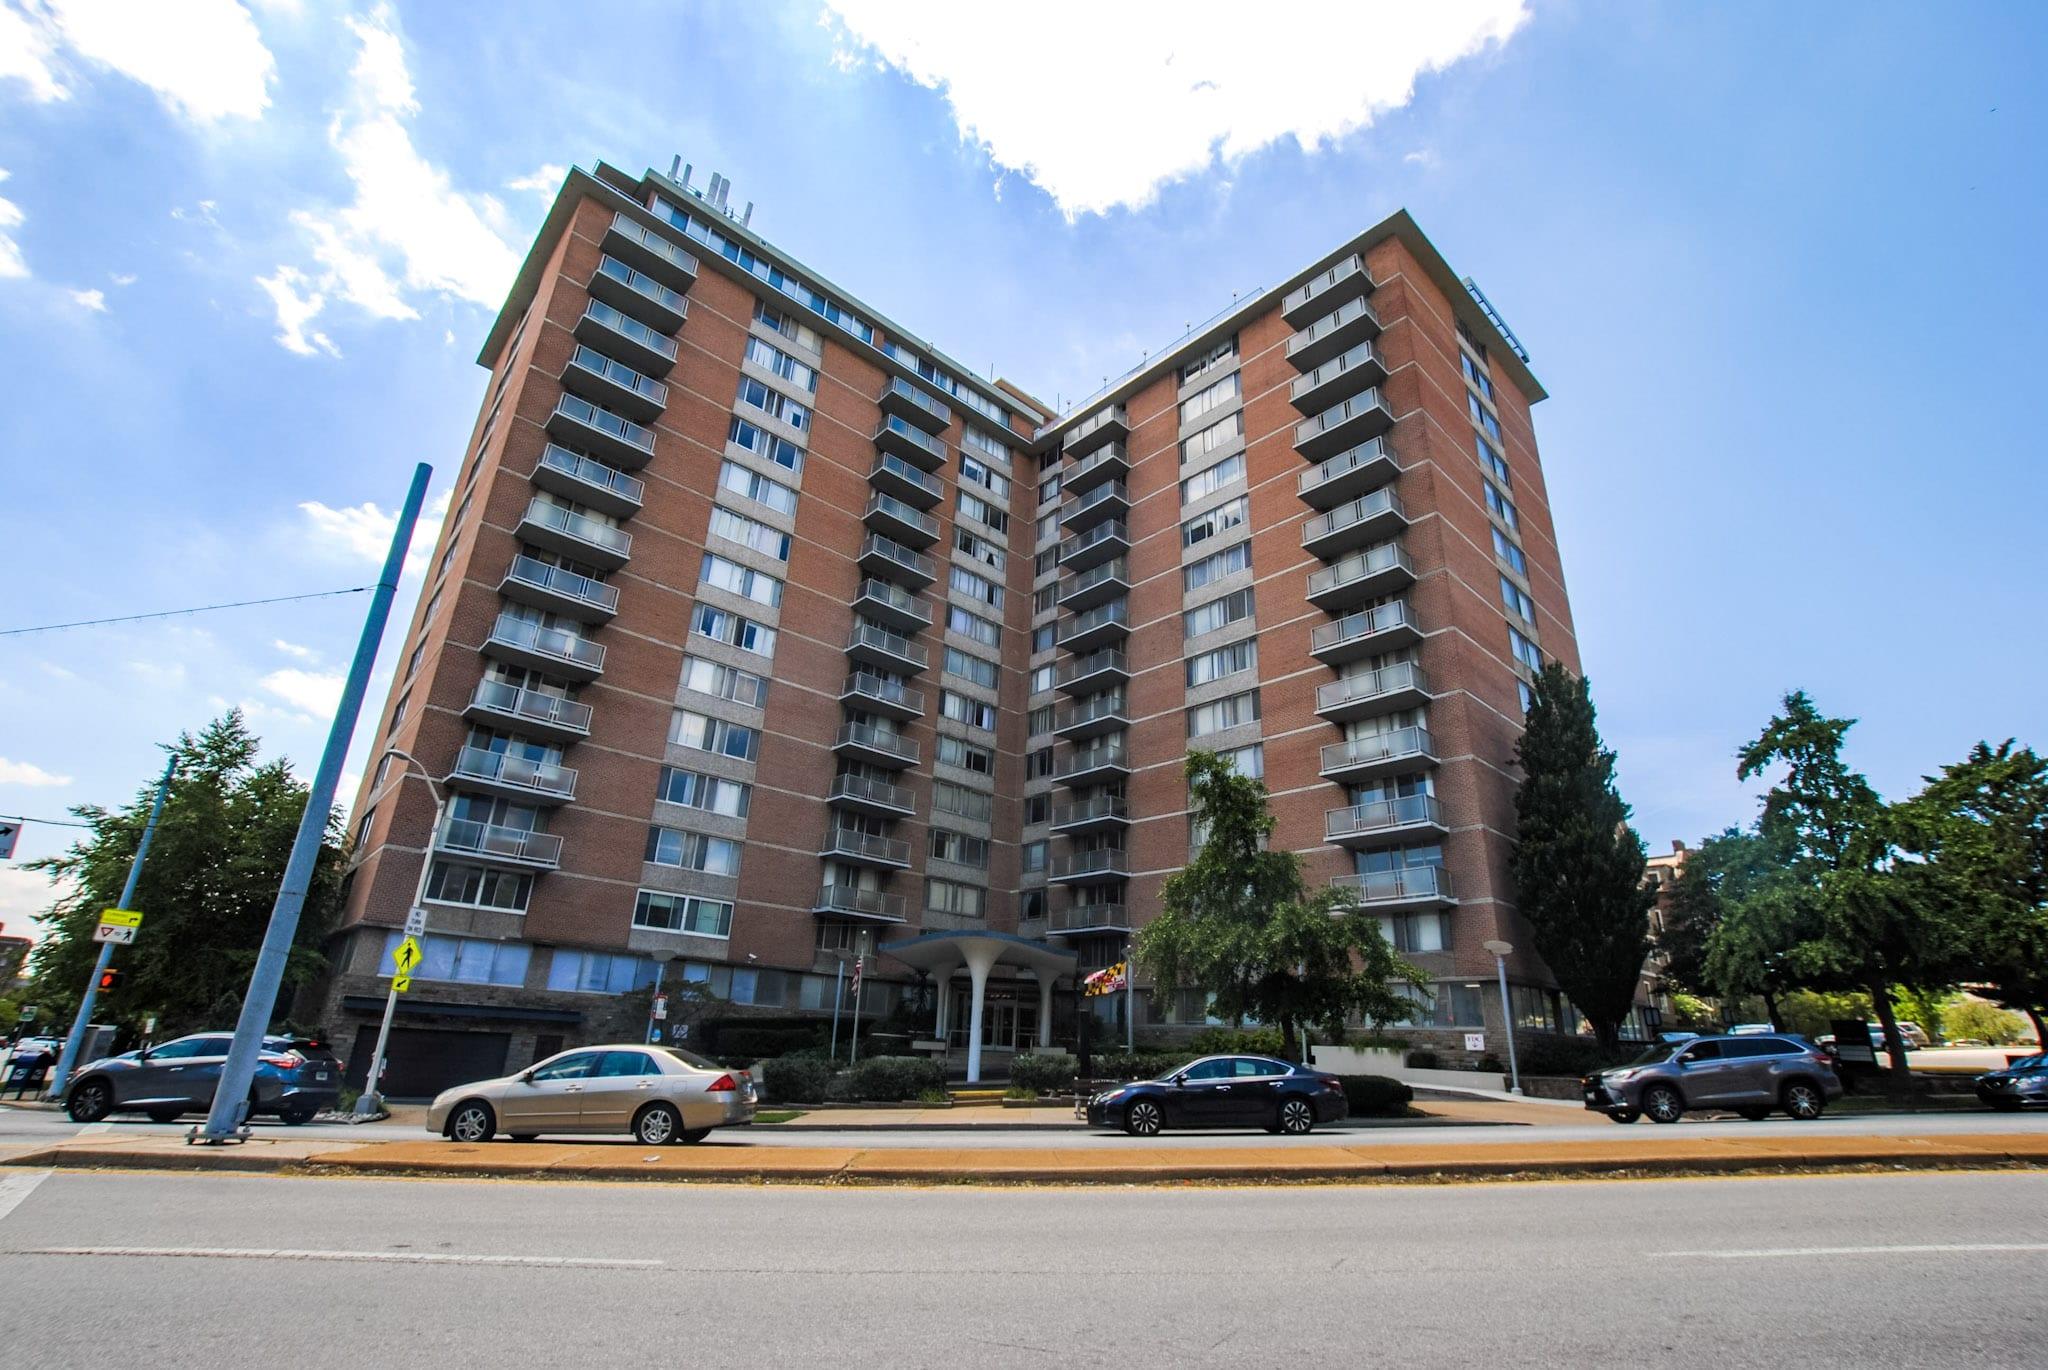 University One Condominium: Two Bedroom Penthouse Suite Next to Johns Hopkins University